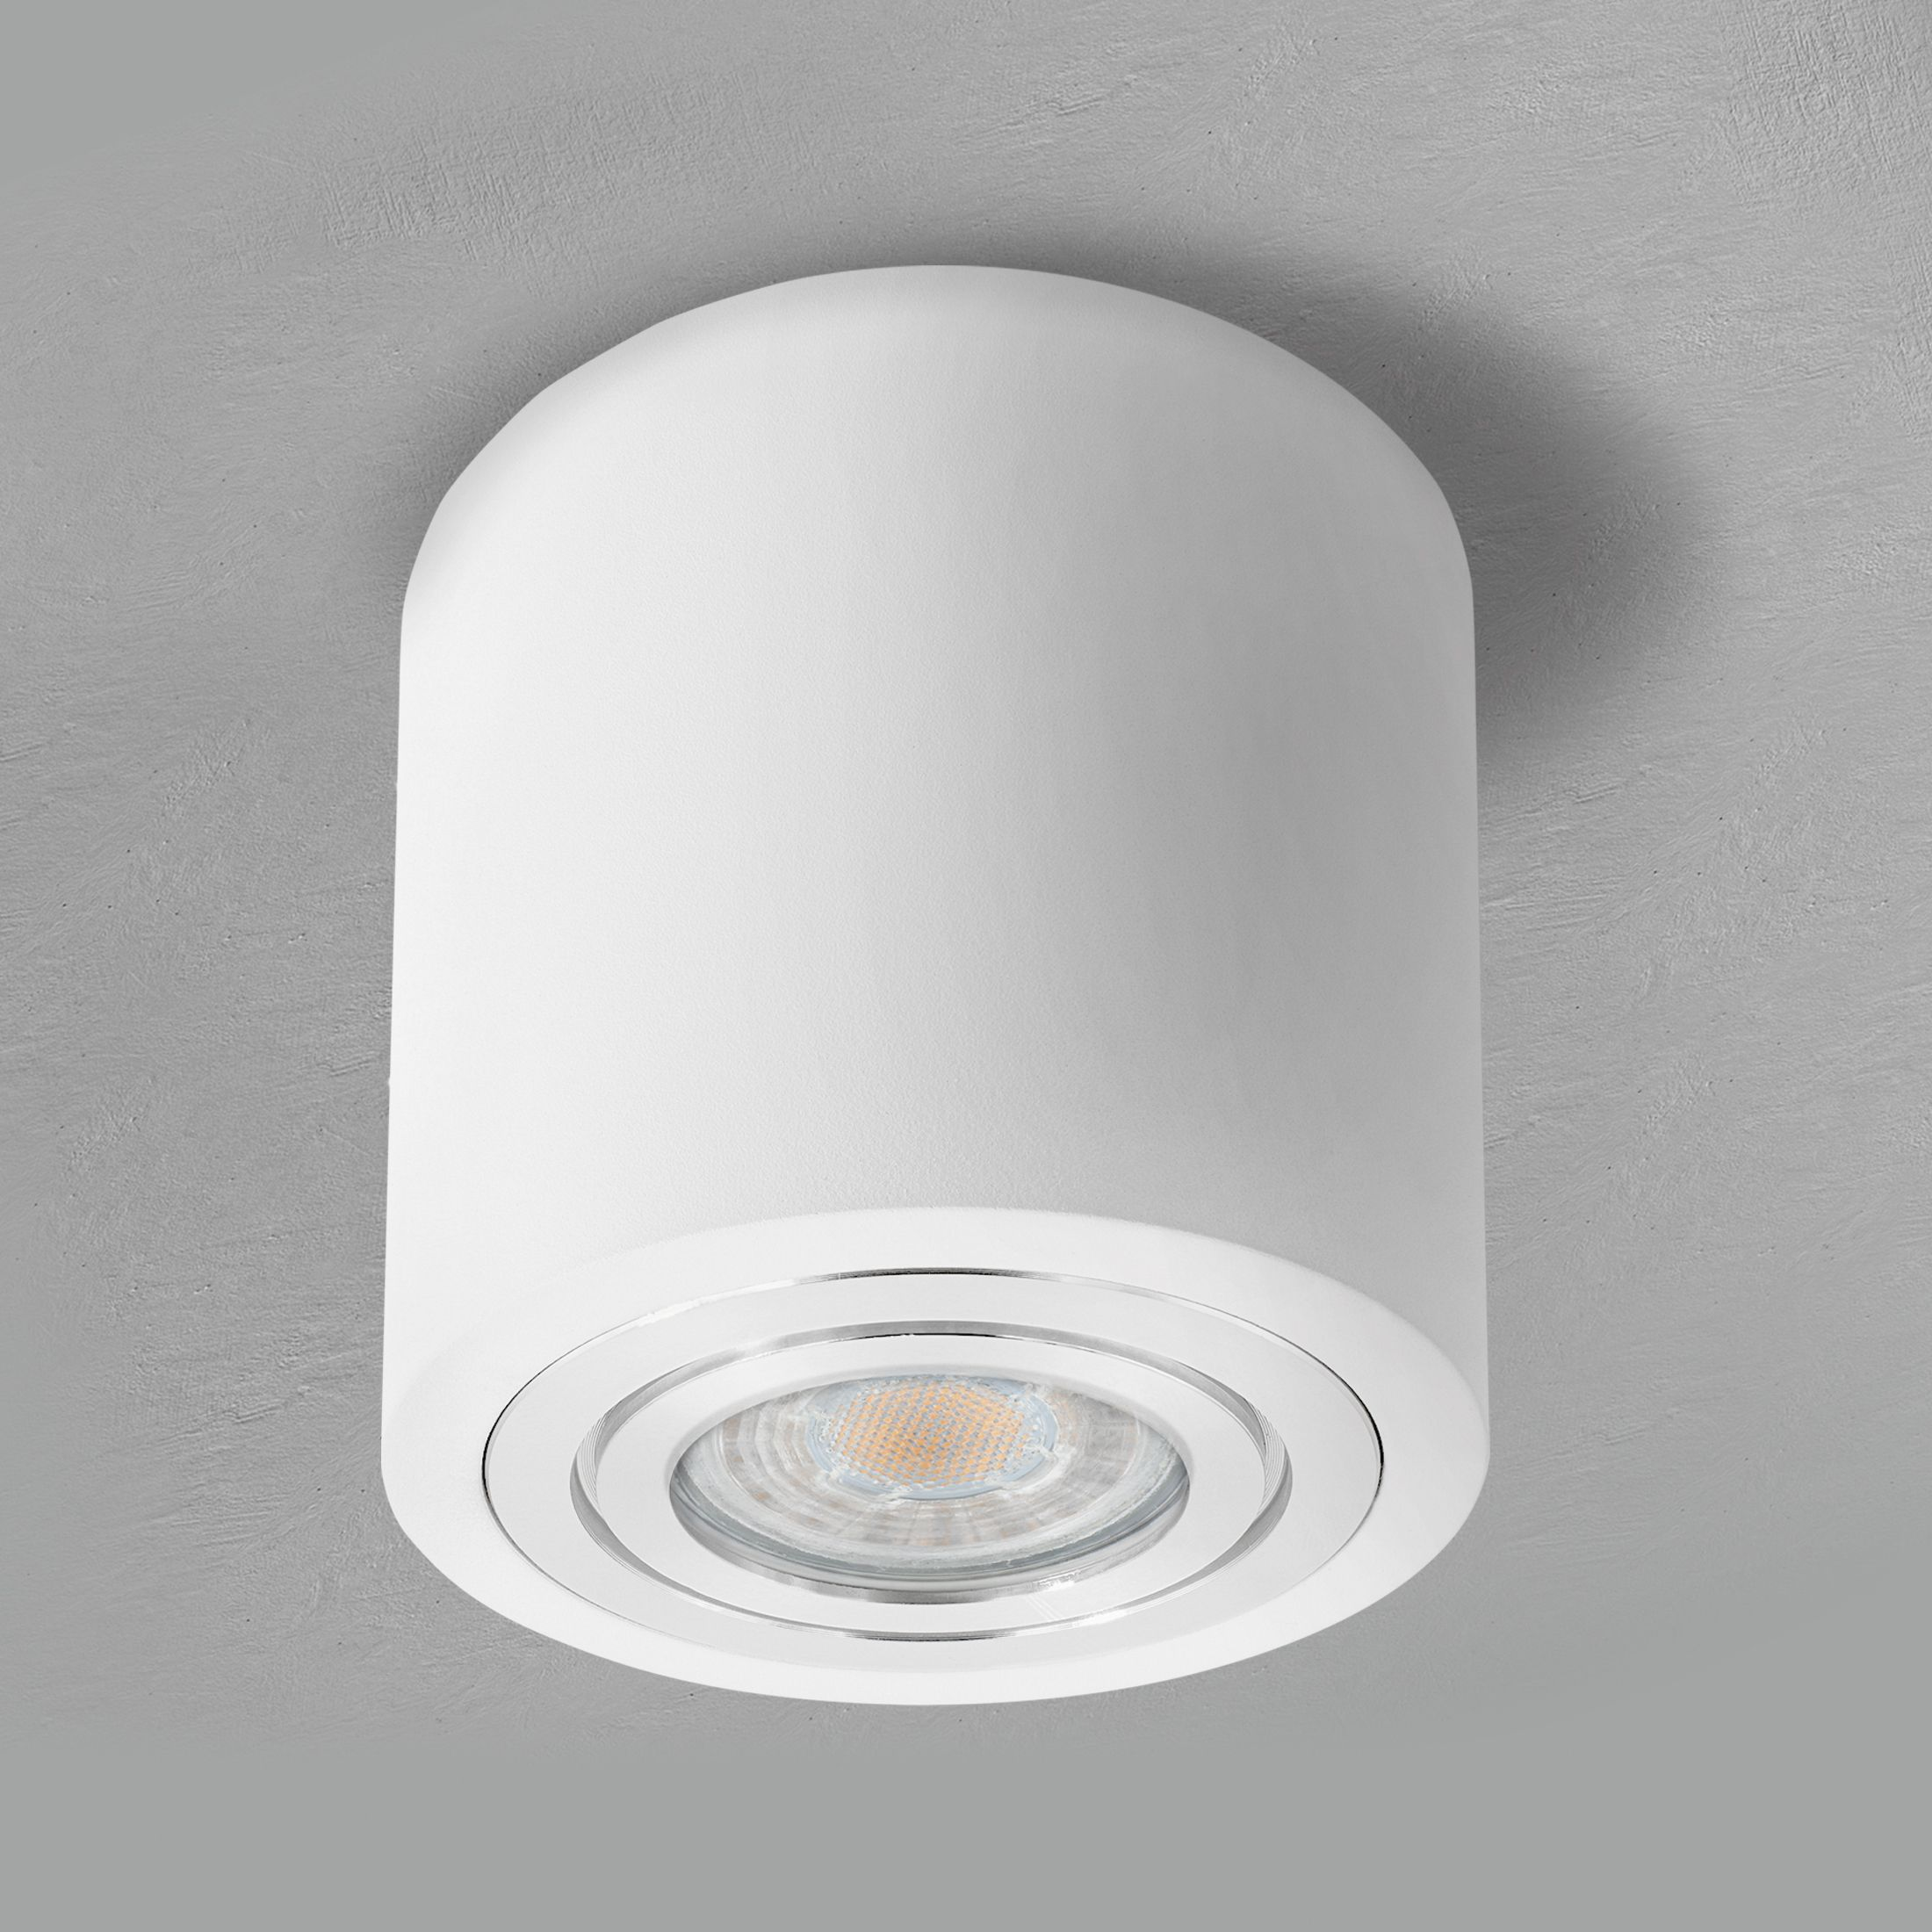 Led Deckenleuchte Bad Ip44 Inkl Led Gu10 6w Warmweiss Aufbauspot In Weiss Rund Led Deckenleuchte Bad Deckenleuchte Bad Beleuchtung